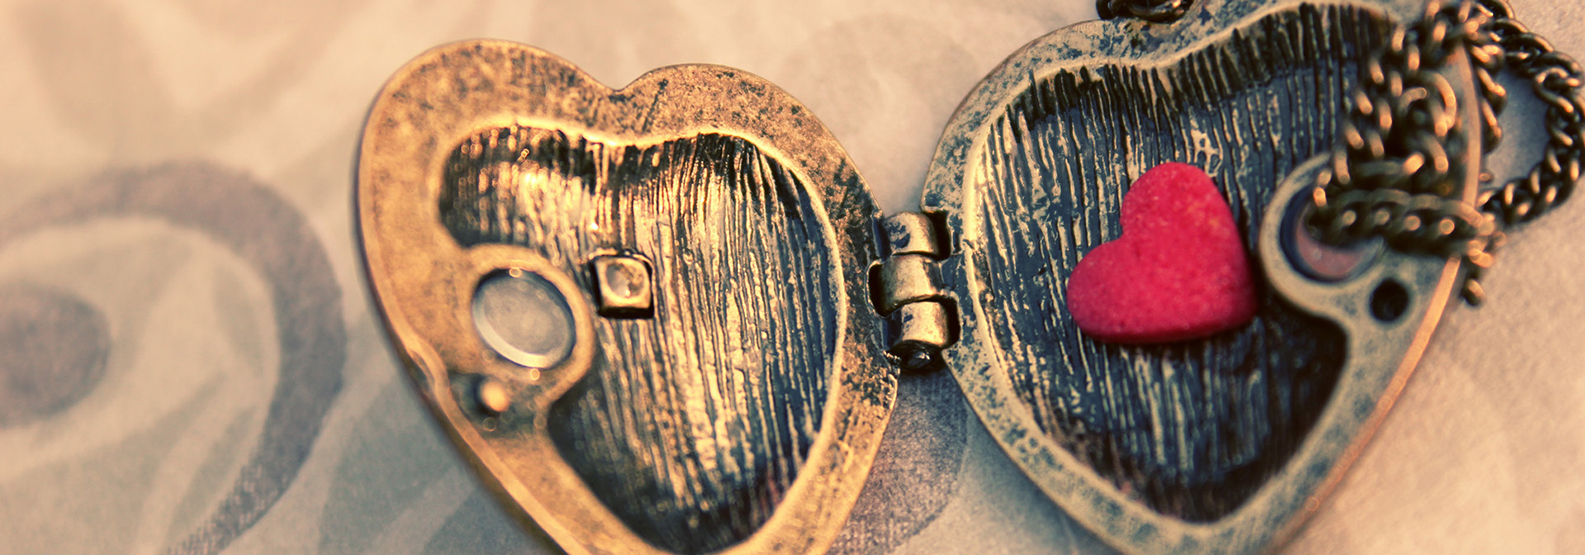 7027102-love-heart-pendant